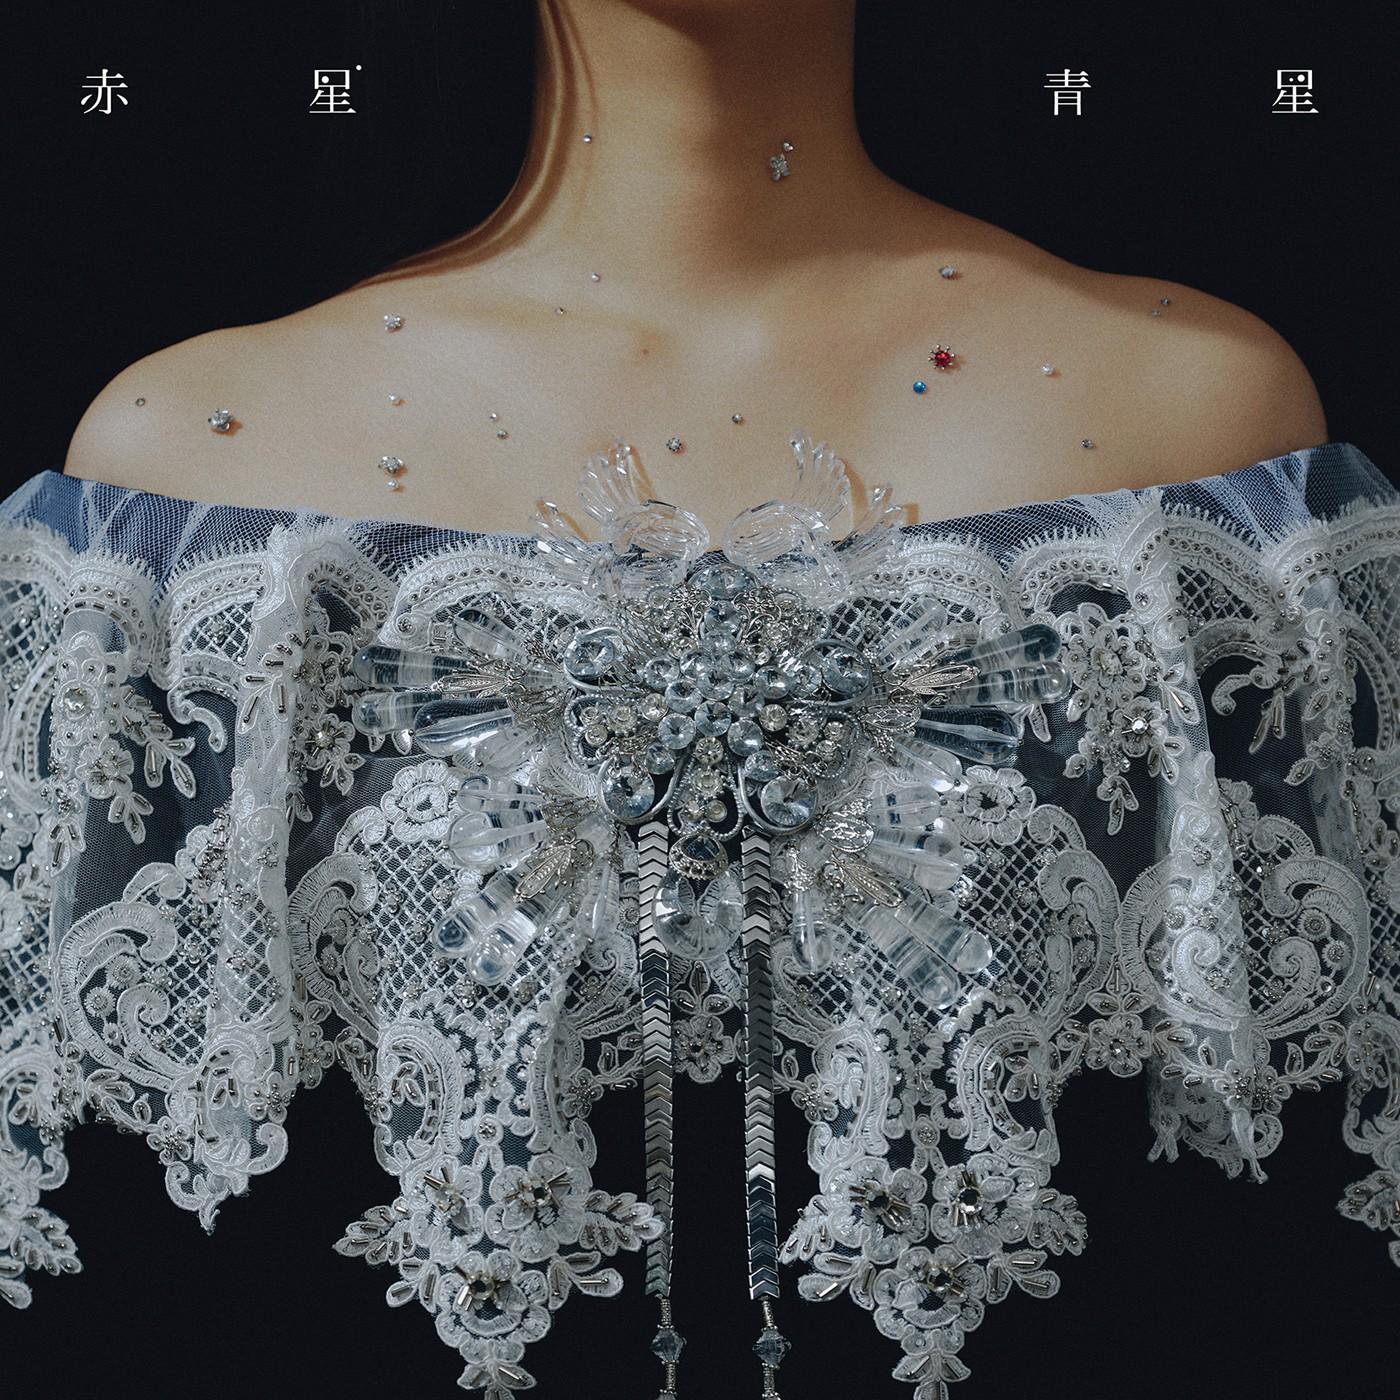 [Album] 吉澤嘉代子 (Kayoko Yoshizawa) – 赤星青星 [FLAC / WEB] [2021.03.17]